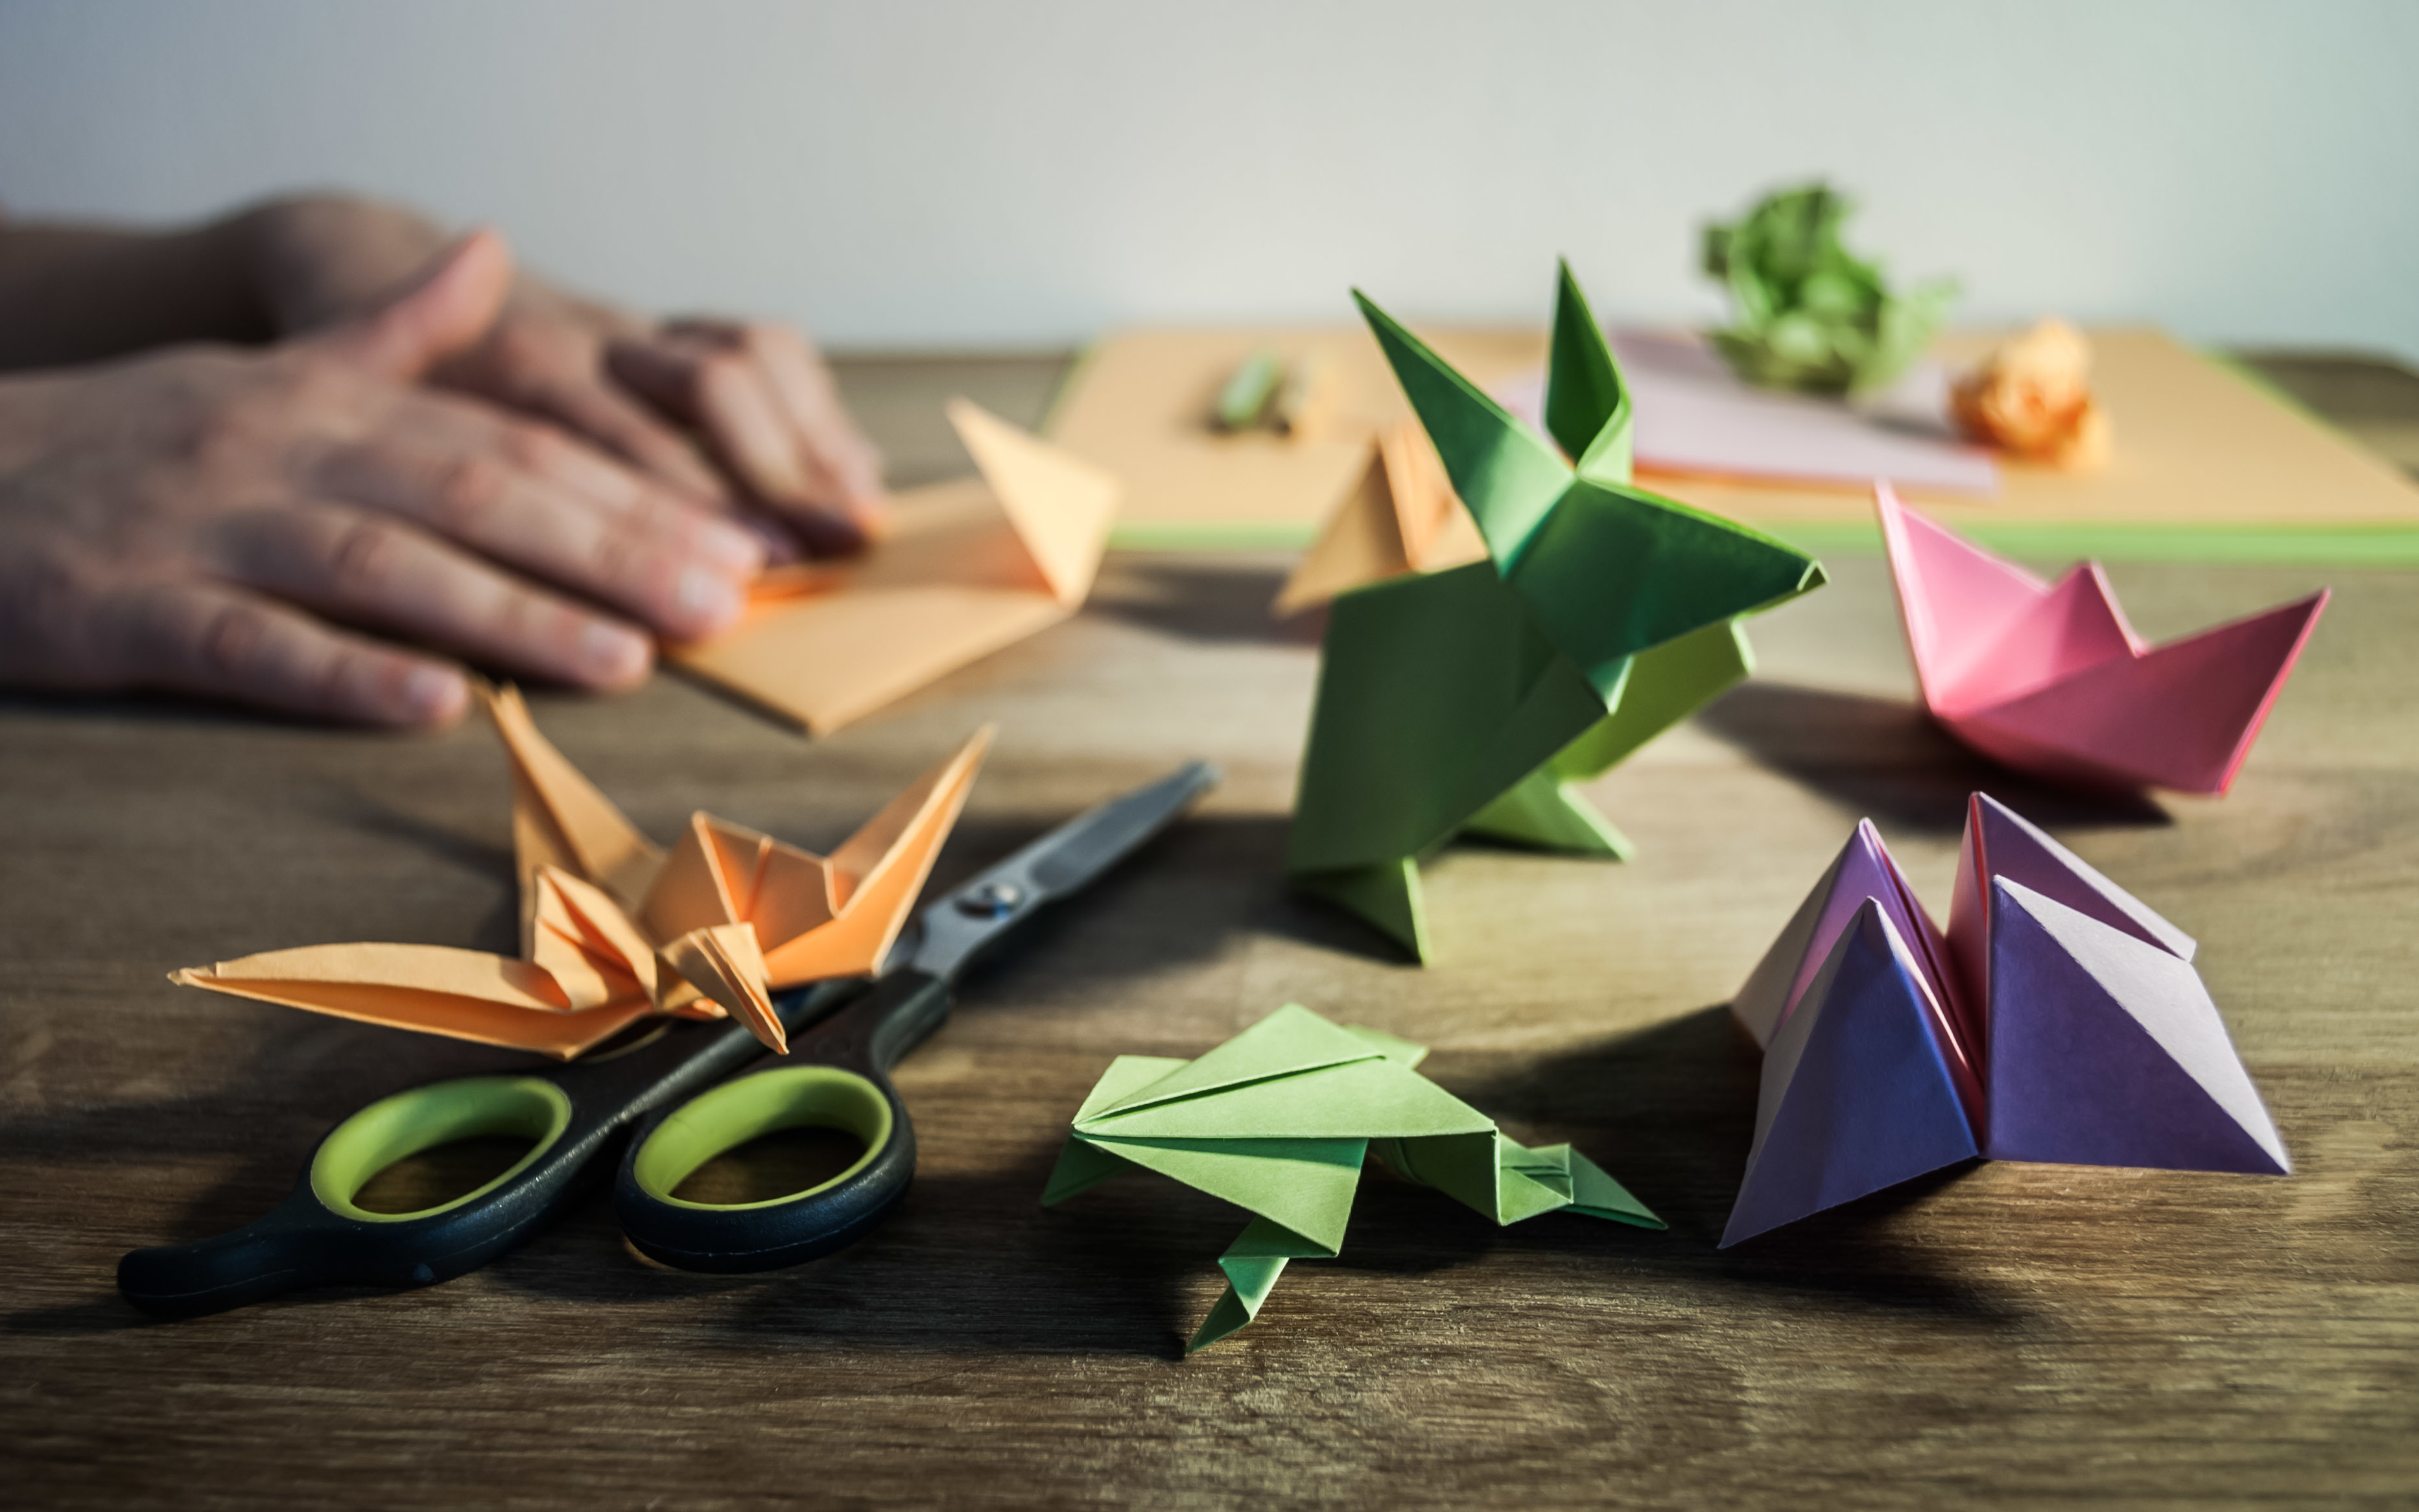 Origami – Η τέχνη του διπλωμένου χαρτιού   Για Ενήλικες